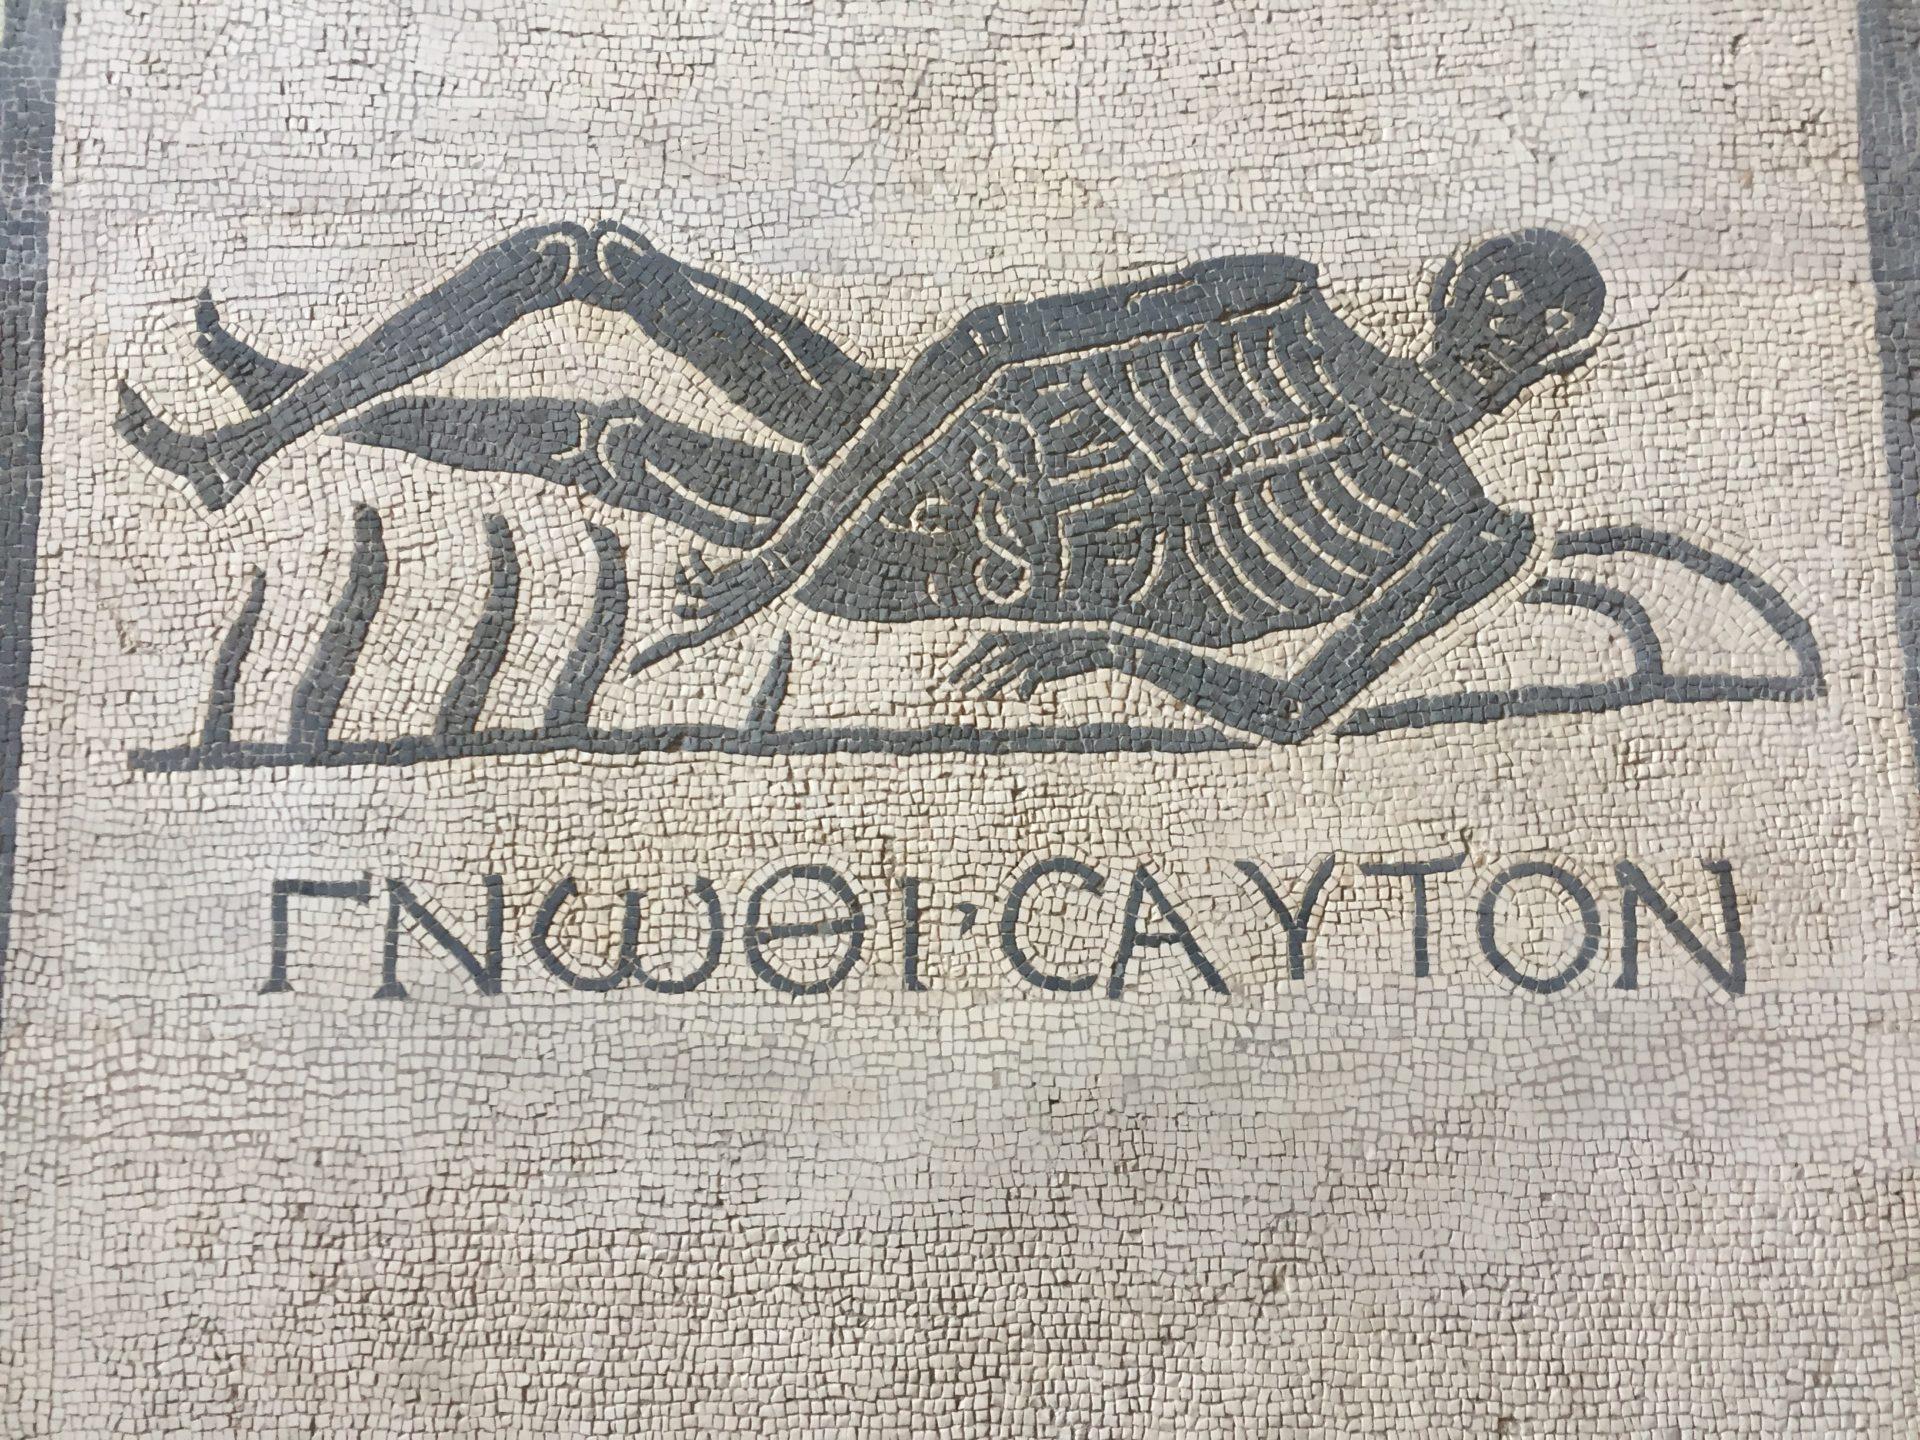 "<img src=""http://marenostrum.pl/wp-content/uploads//2019/11/Poznaj-samego-siebie-termy-Dioklecjana.jpeg"" alt=""poznaj samego siebie szkielet termy dioklecjana/>"